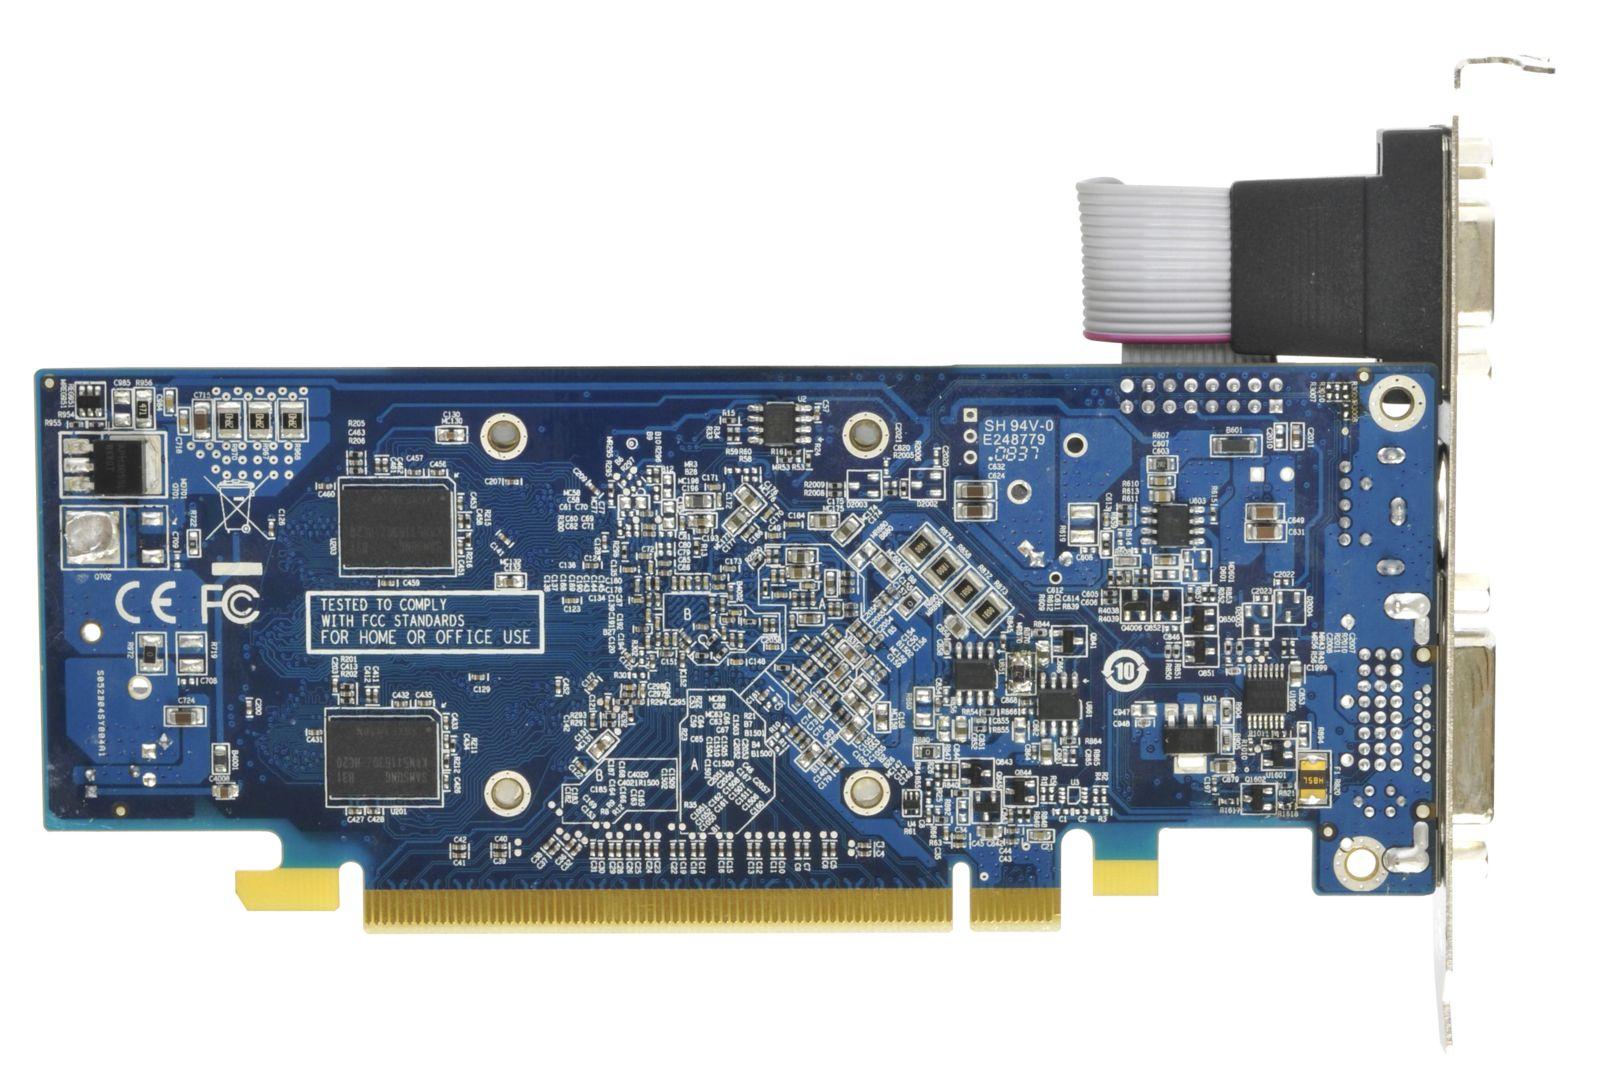 HIS HD 4350 Silence 256MB (64bit) DDR2 PCIe < Legacy